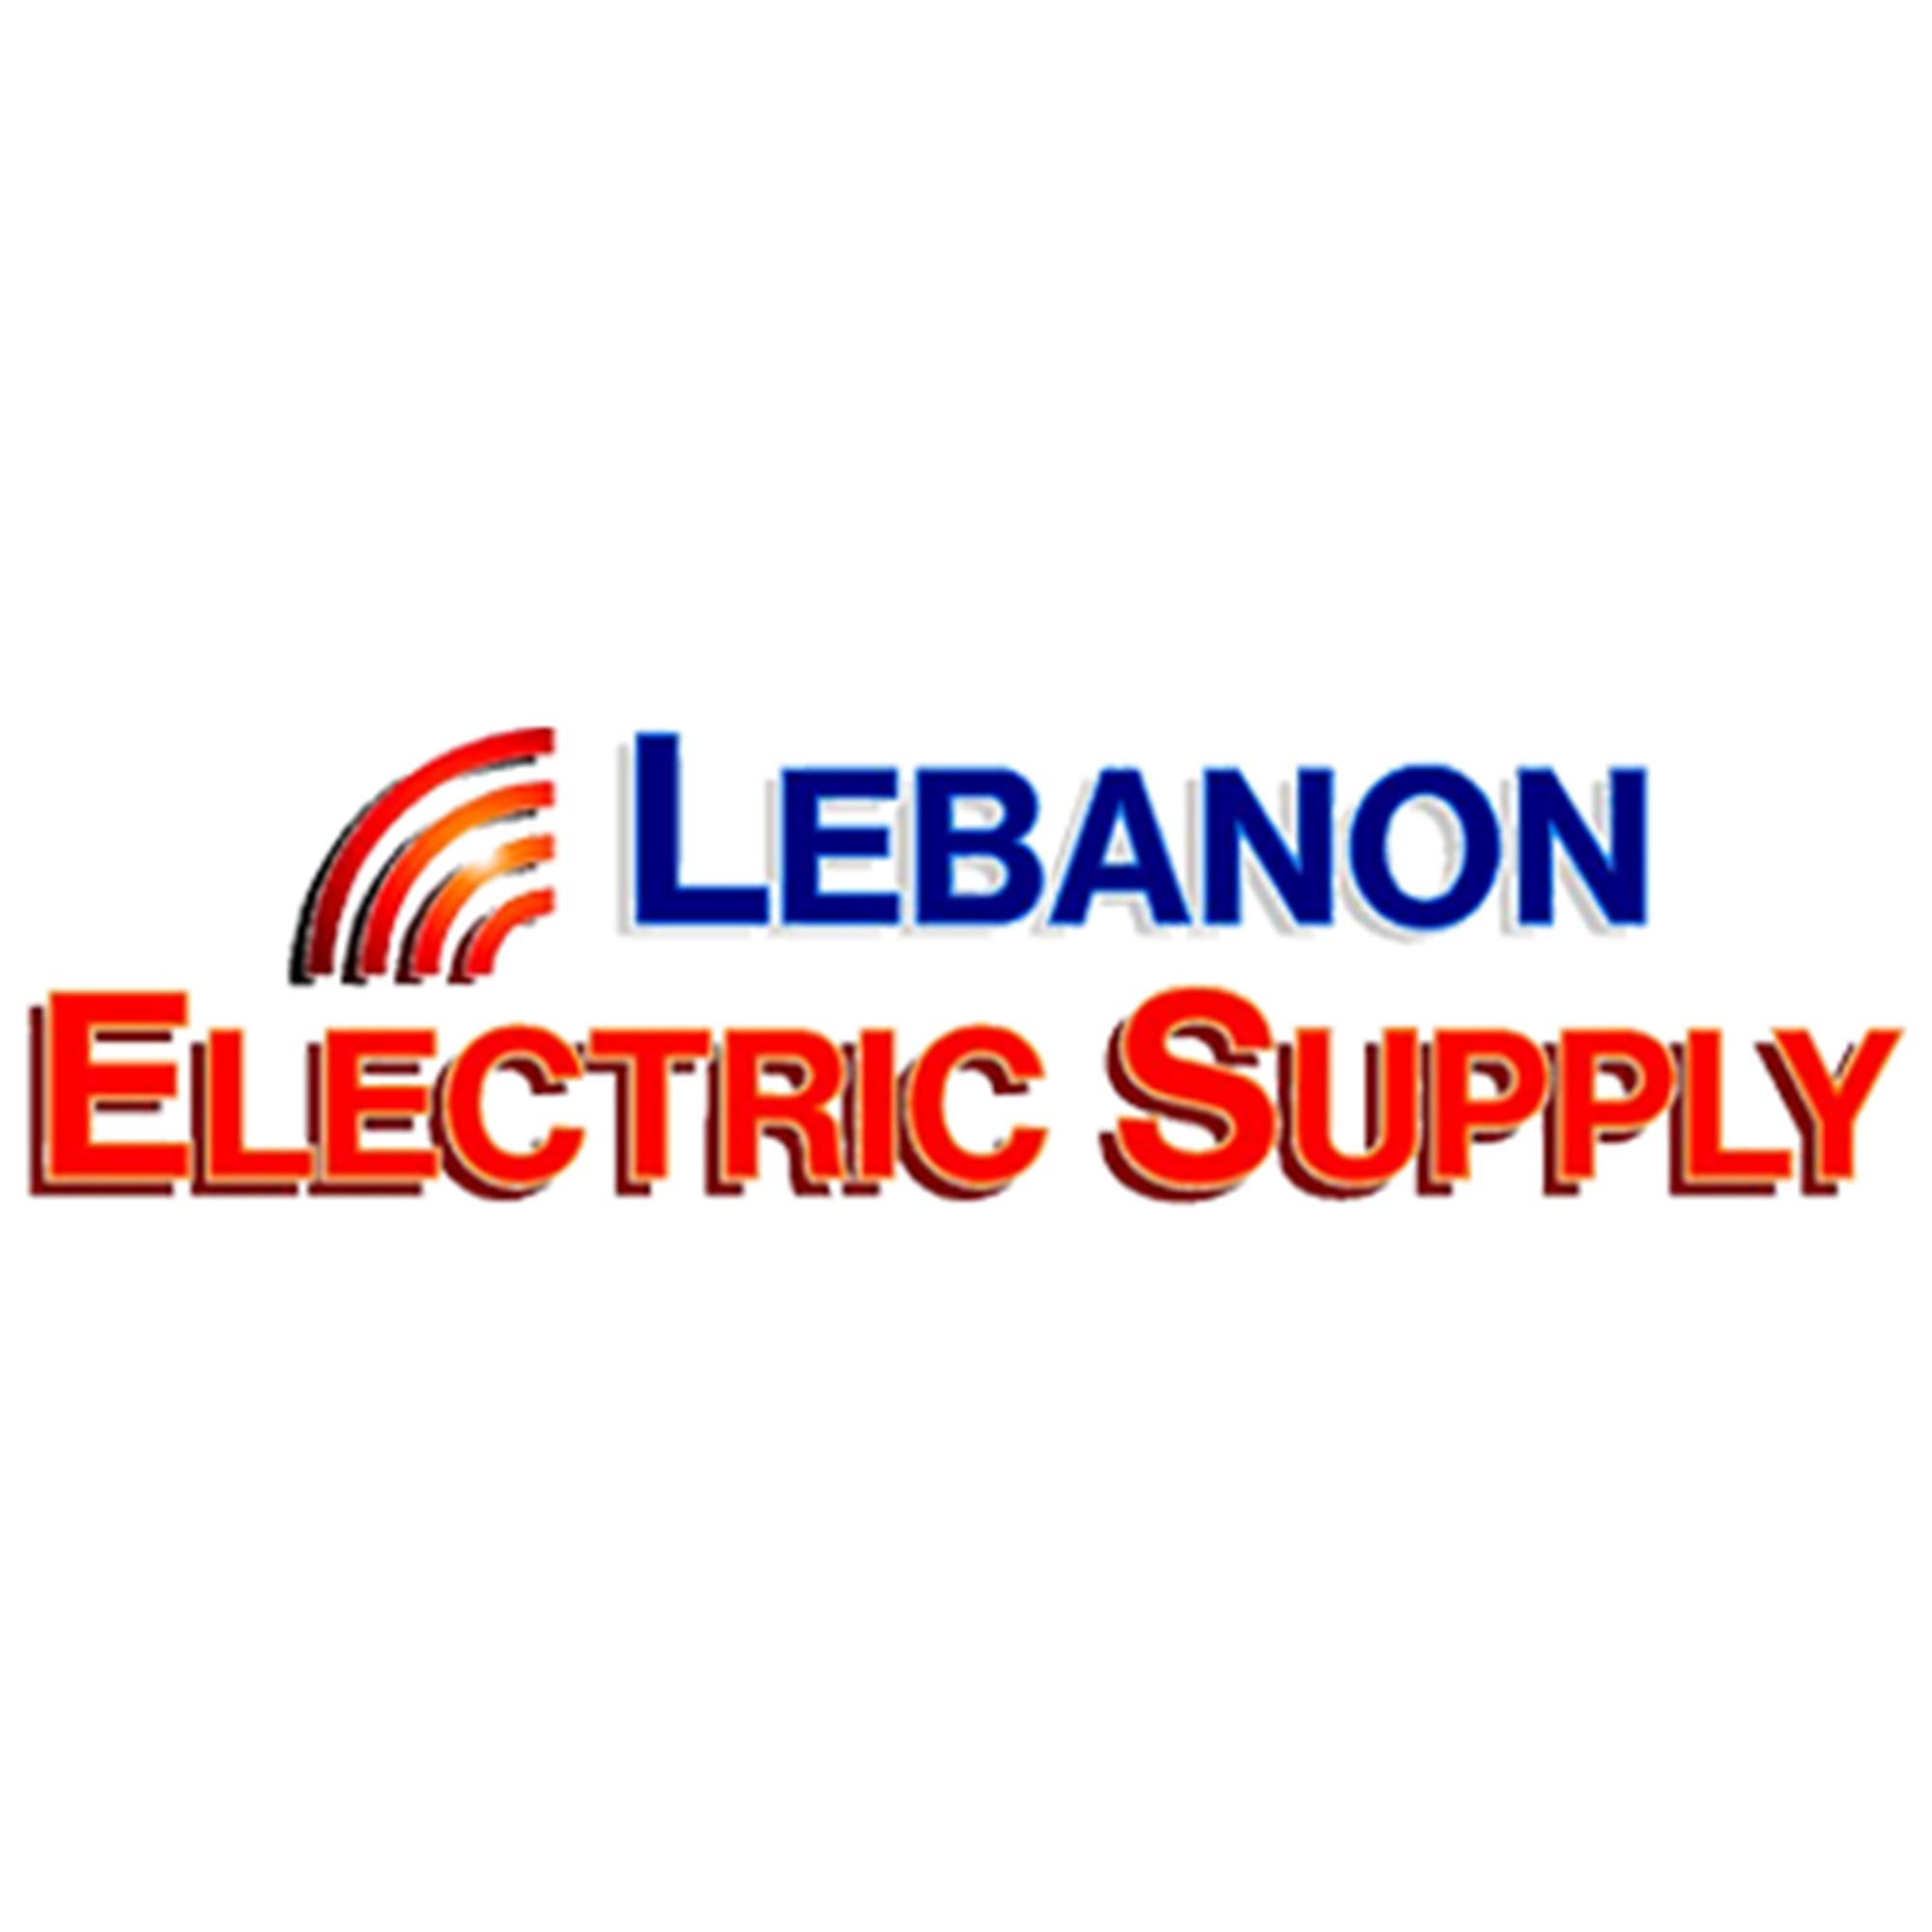 Troy Csl Lighting Inc Company. csl. lebanon electric supply inc 602 ...